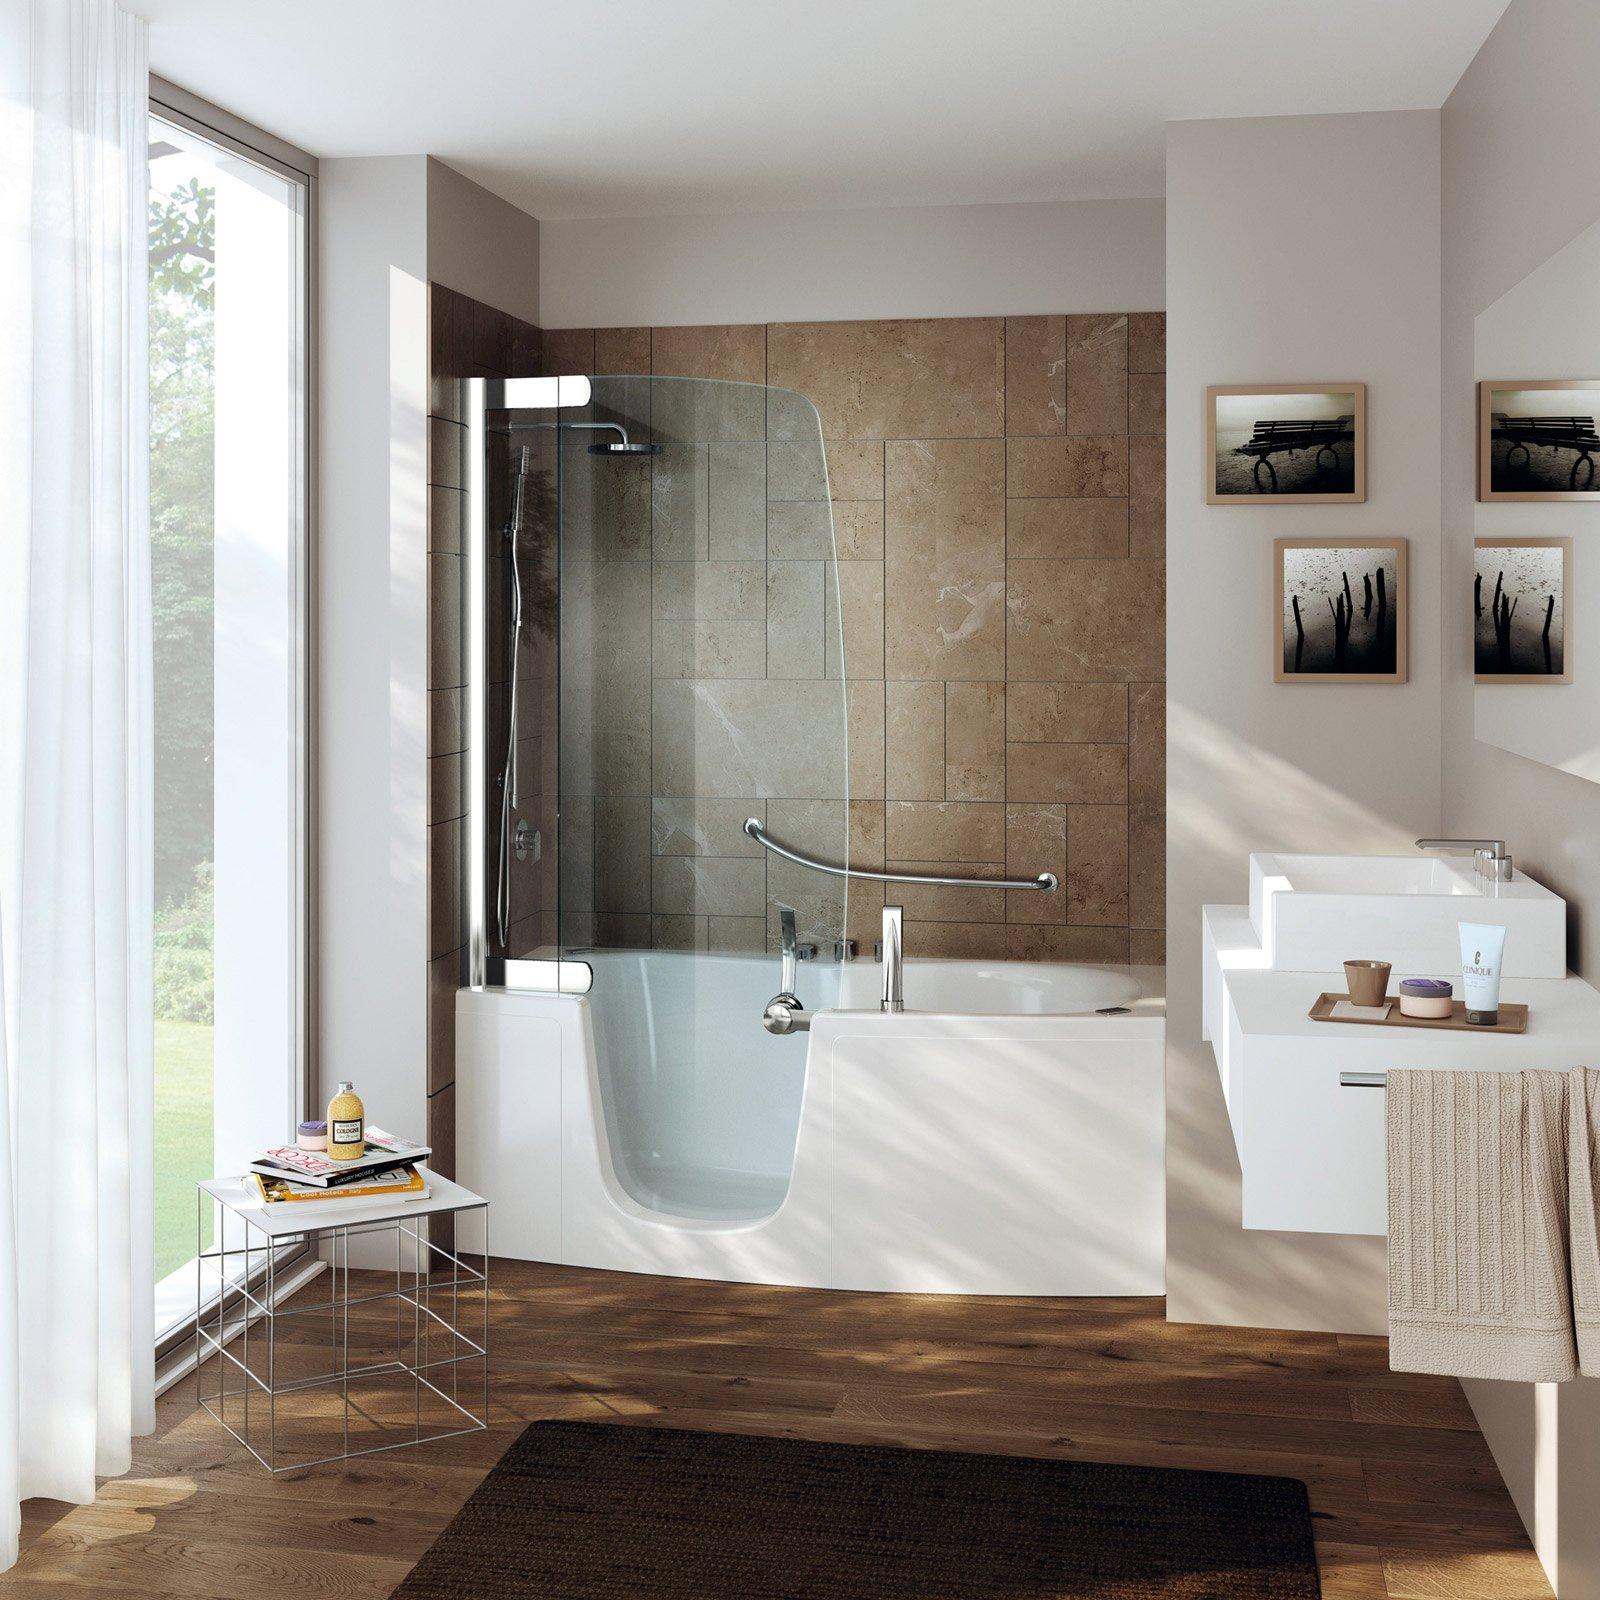 Vasca e doccia insieme cose di casa - Vasca da bagno acciaio prezzi ...